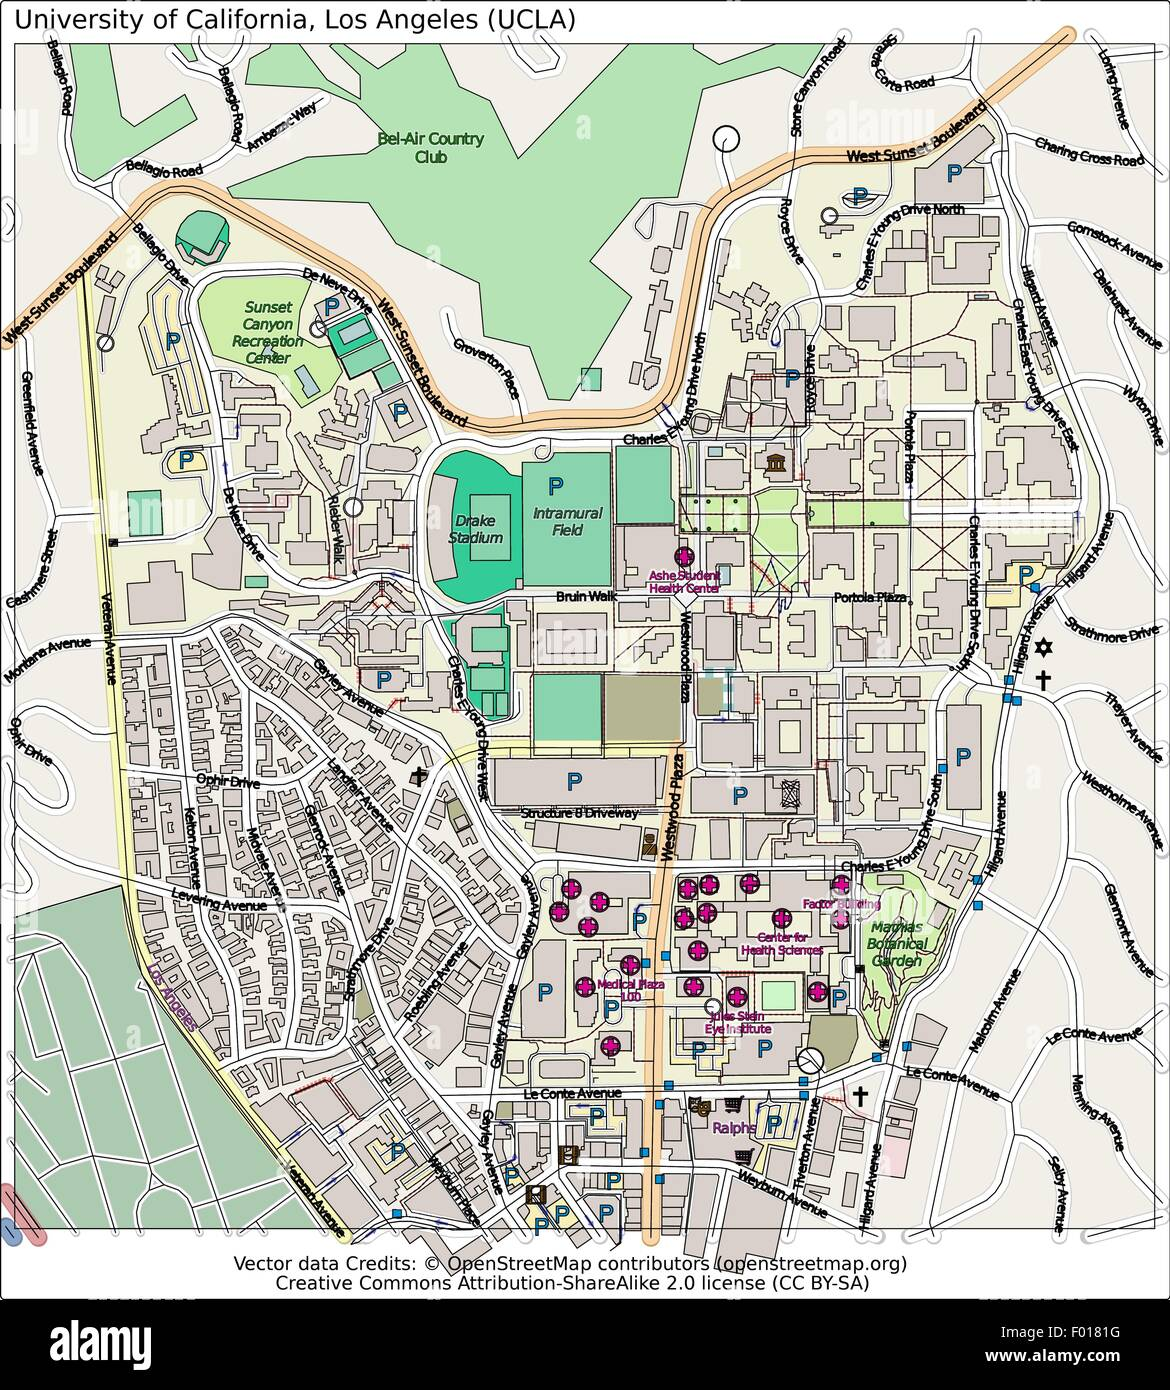 University California Map.University Of California Los Angeles Ucla City Map Aerial View Stock